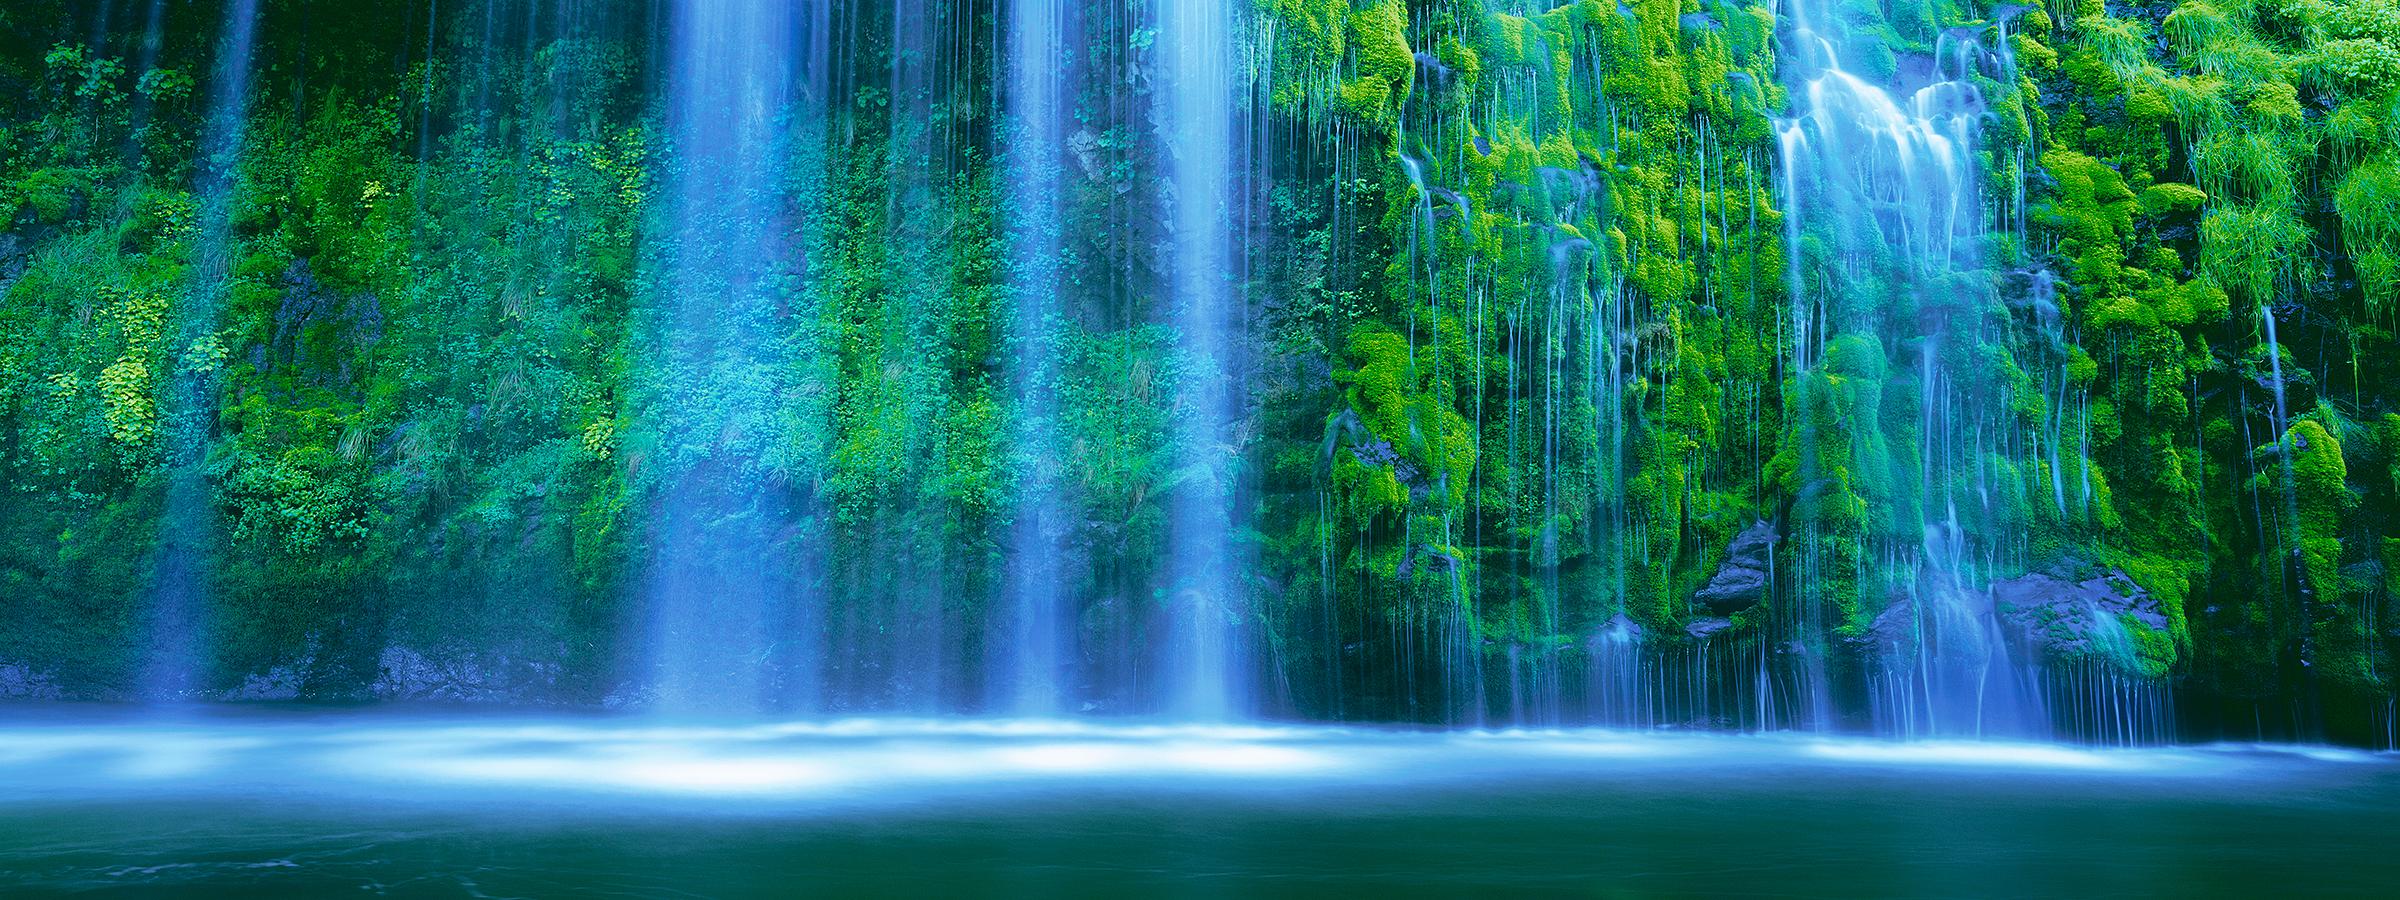 Moss Brae Falls.jpg